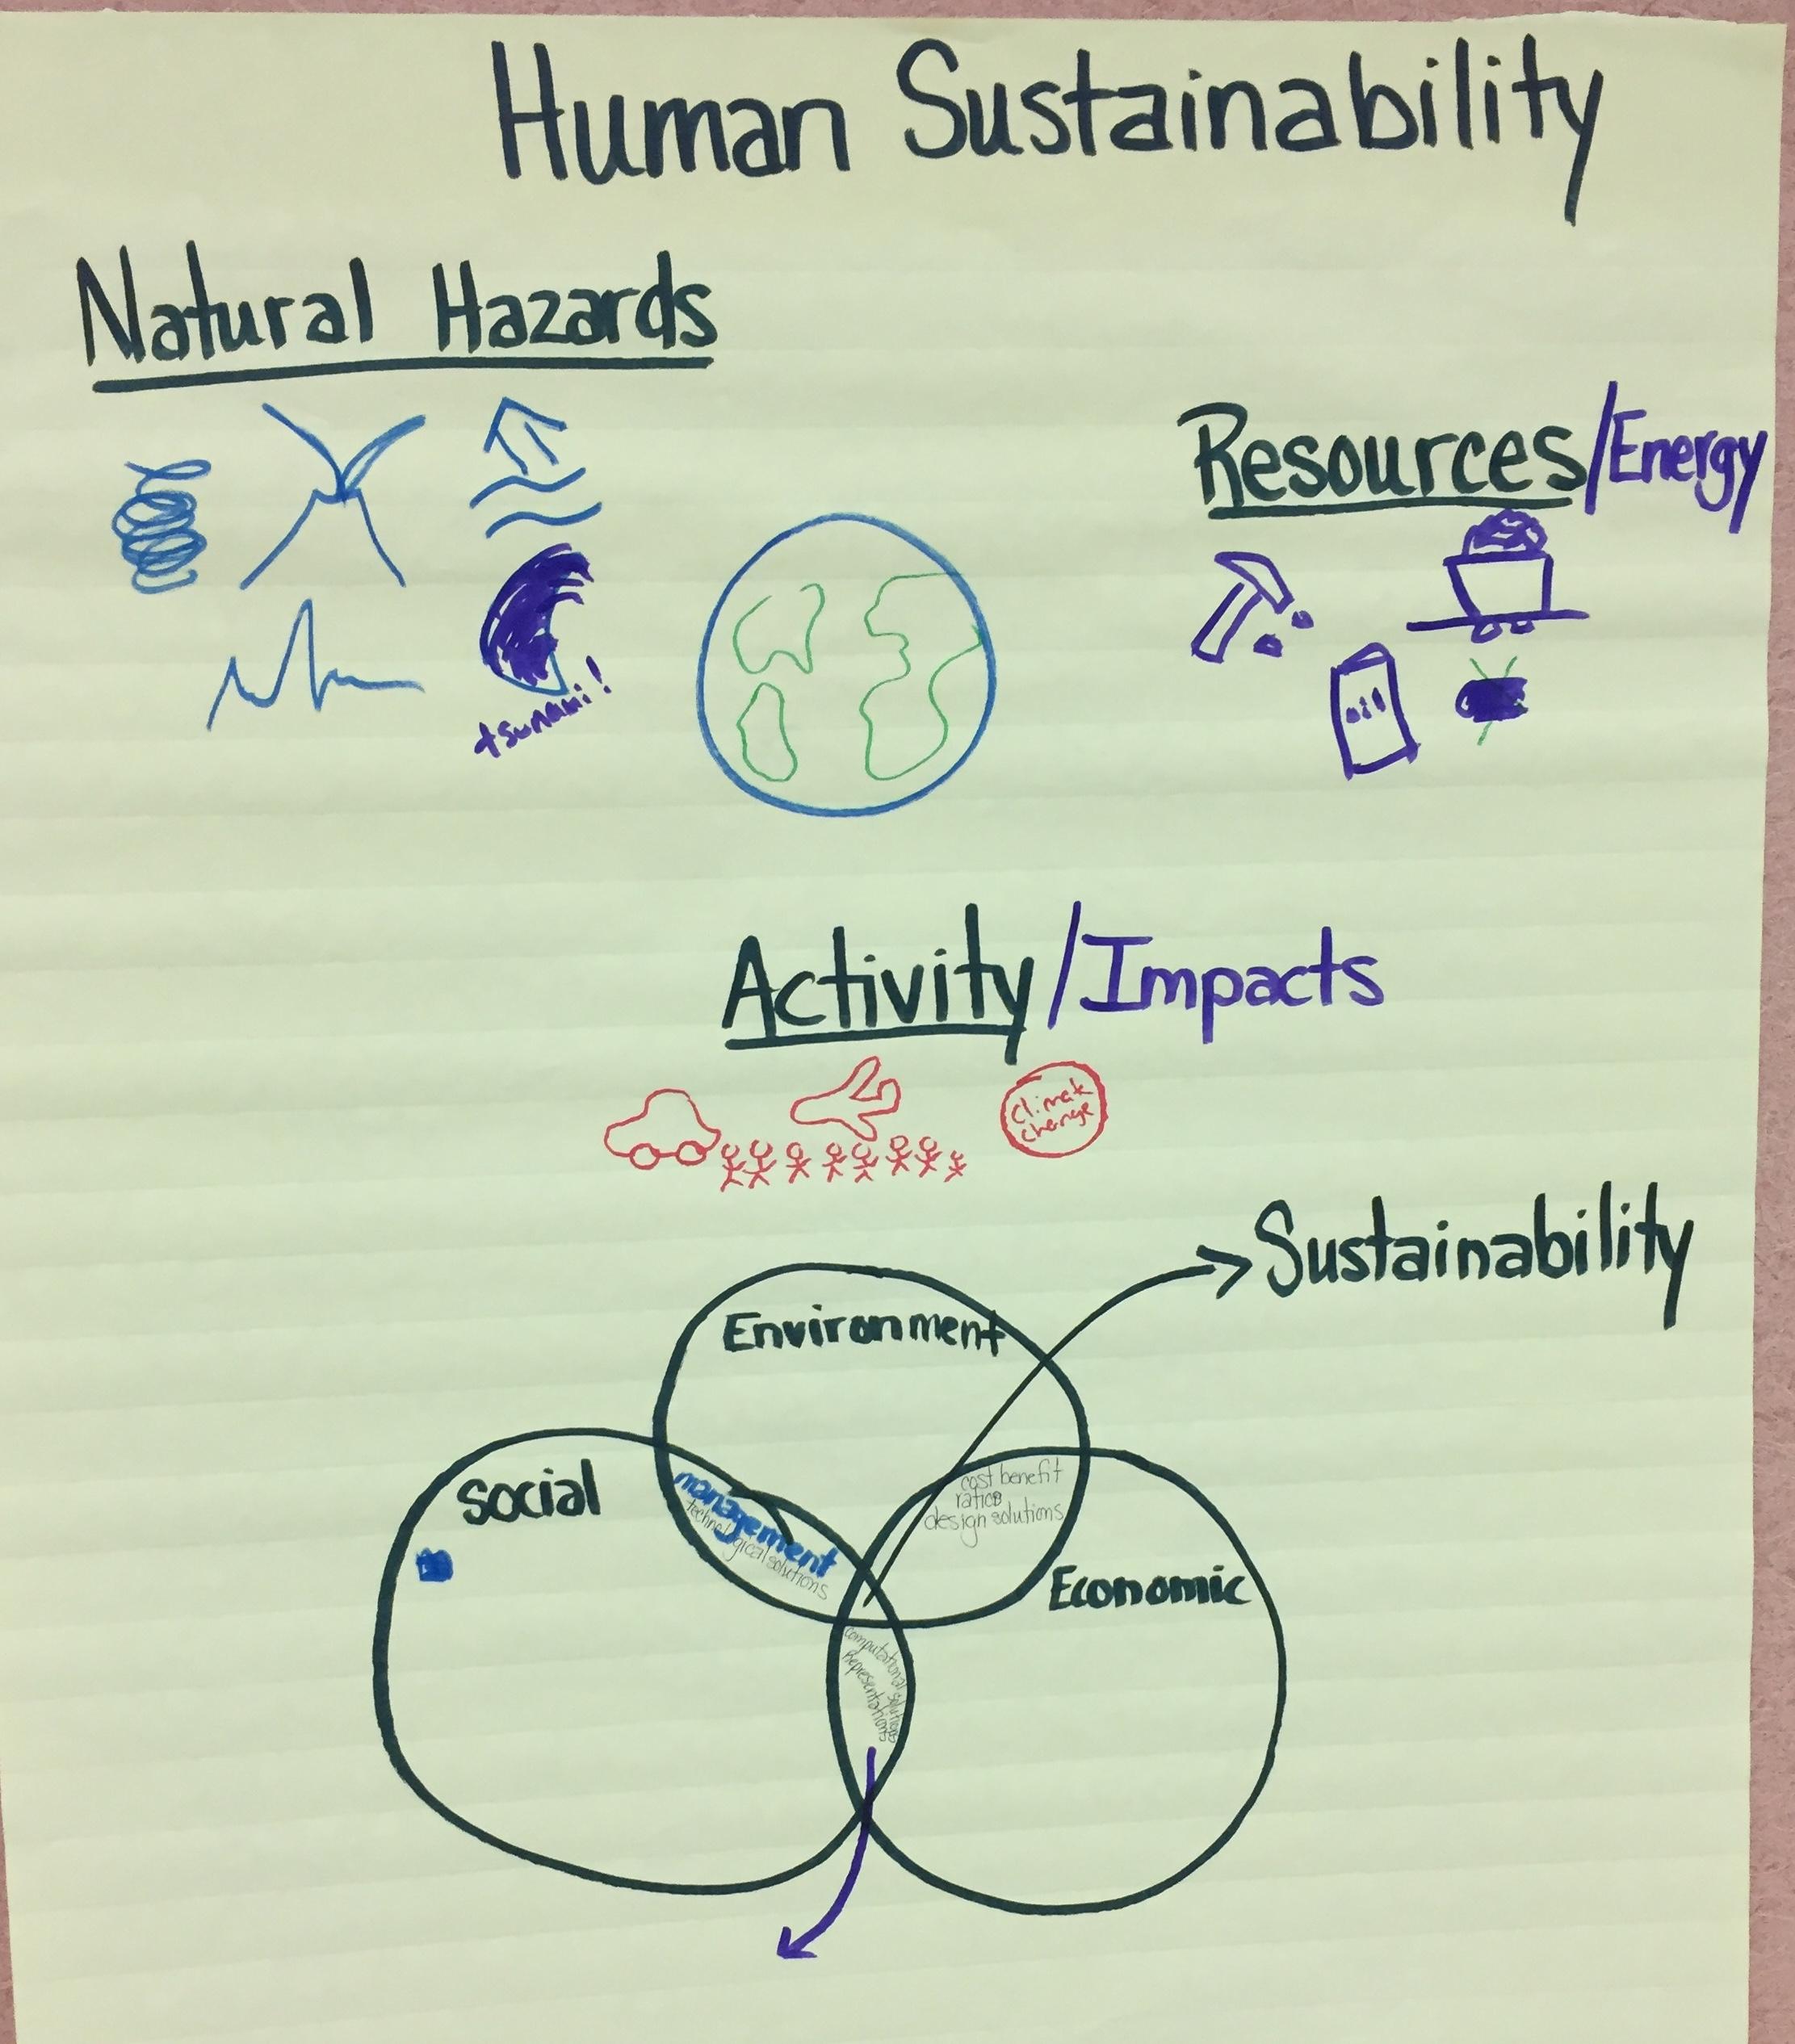 HS Human Sustainability.JPG